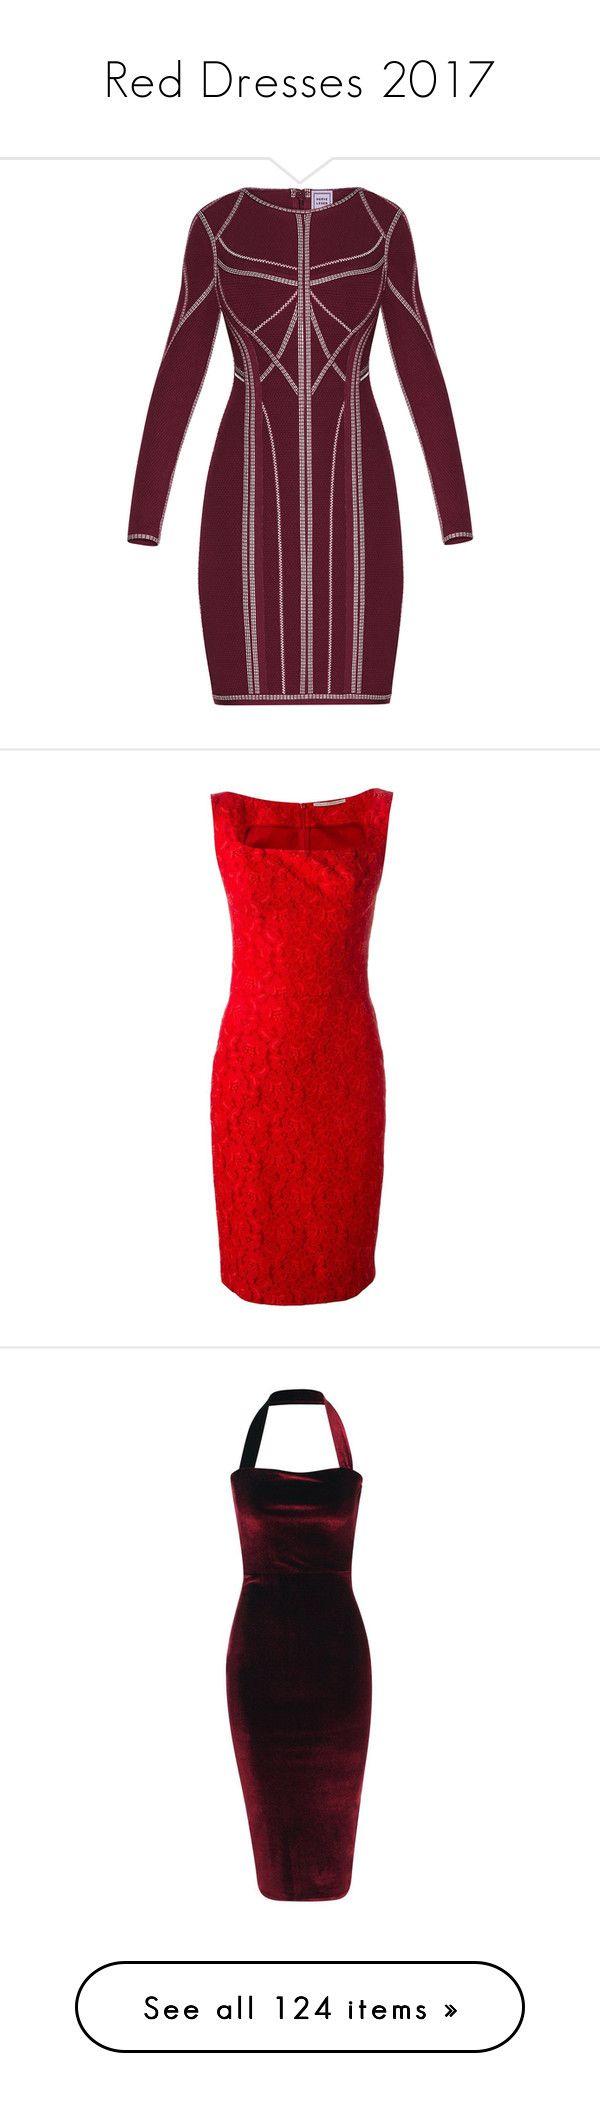 """Red Dresses 2017"" by leptismagna ❤ liked on Polyvore featuring reddress, dresses, cocktail dresses, herve leger dress, purple bandage dress, metallic cocktail dress, bodycon bandage dress, red, red lace dress and lace cocktail dress"